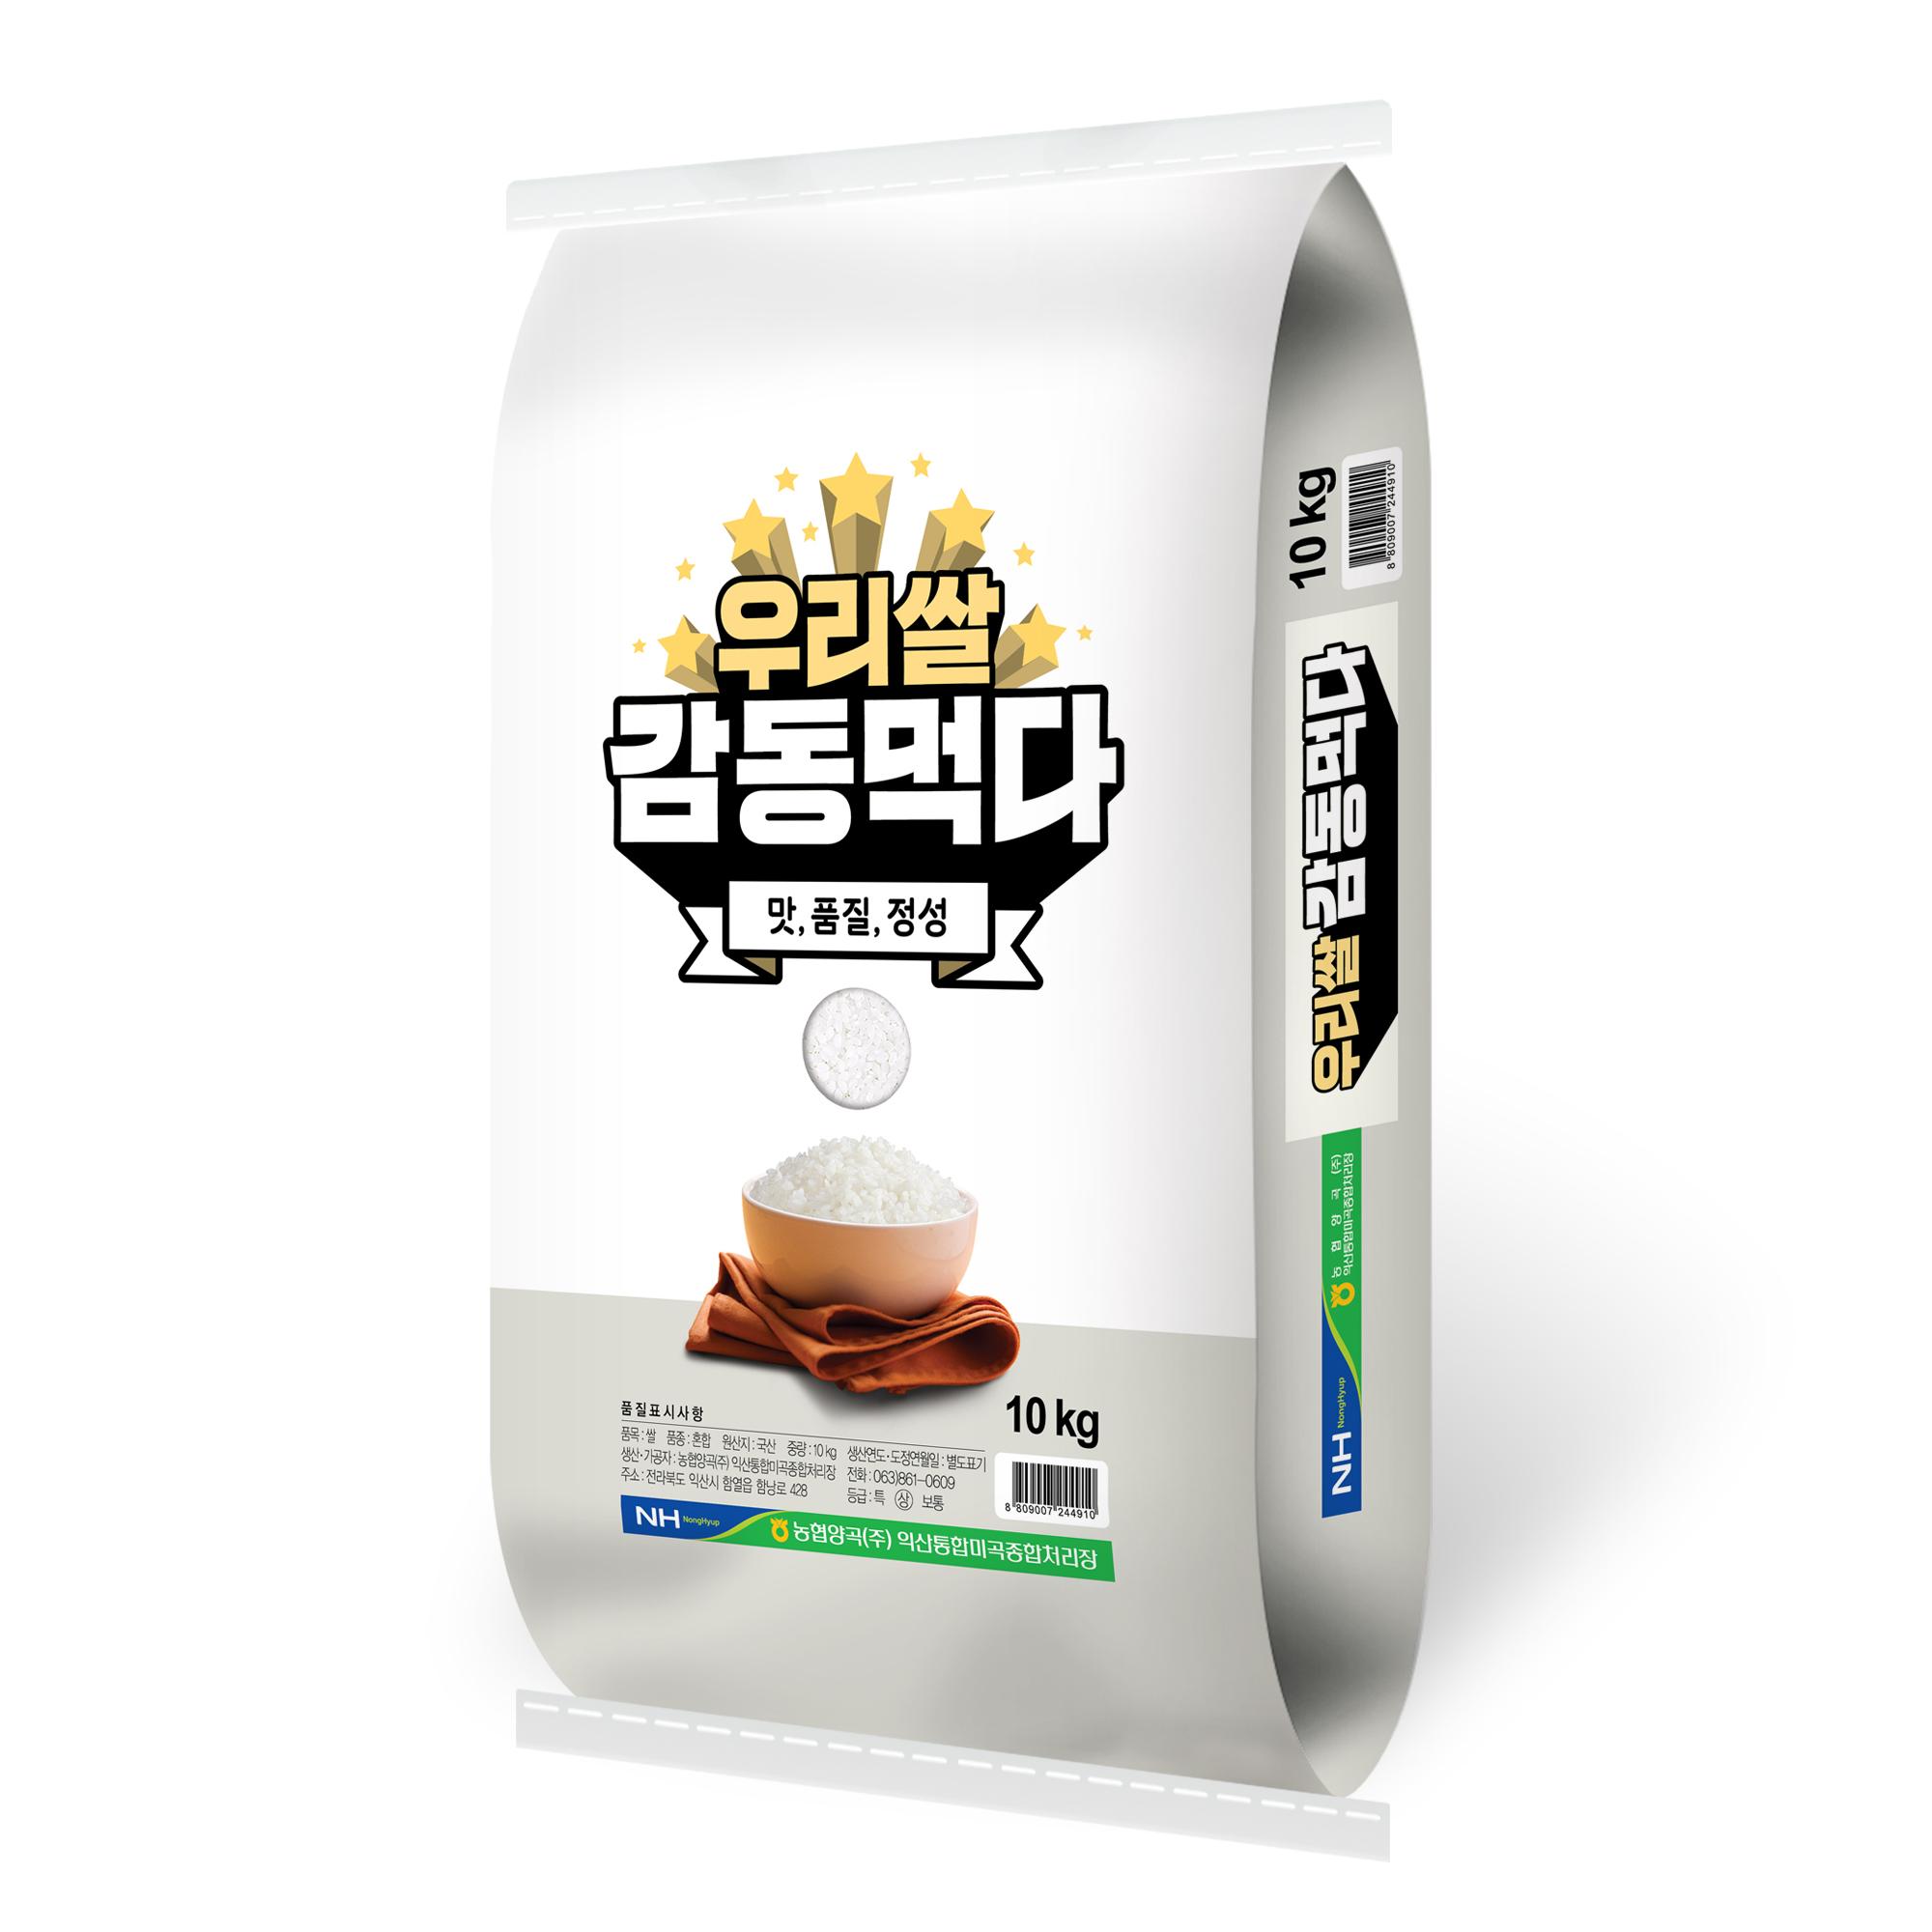 [Gold box] 농협 2020년 우리쌀 감동먹다 백미(상등급), 1개, 10kg - 랭킹9위 (29890원)